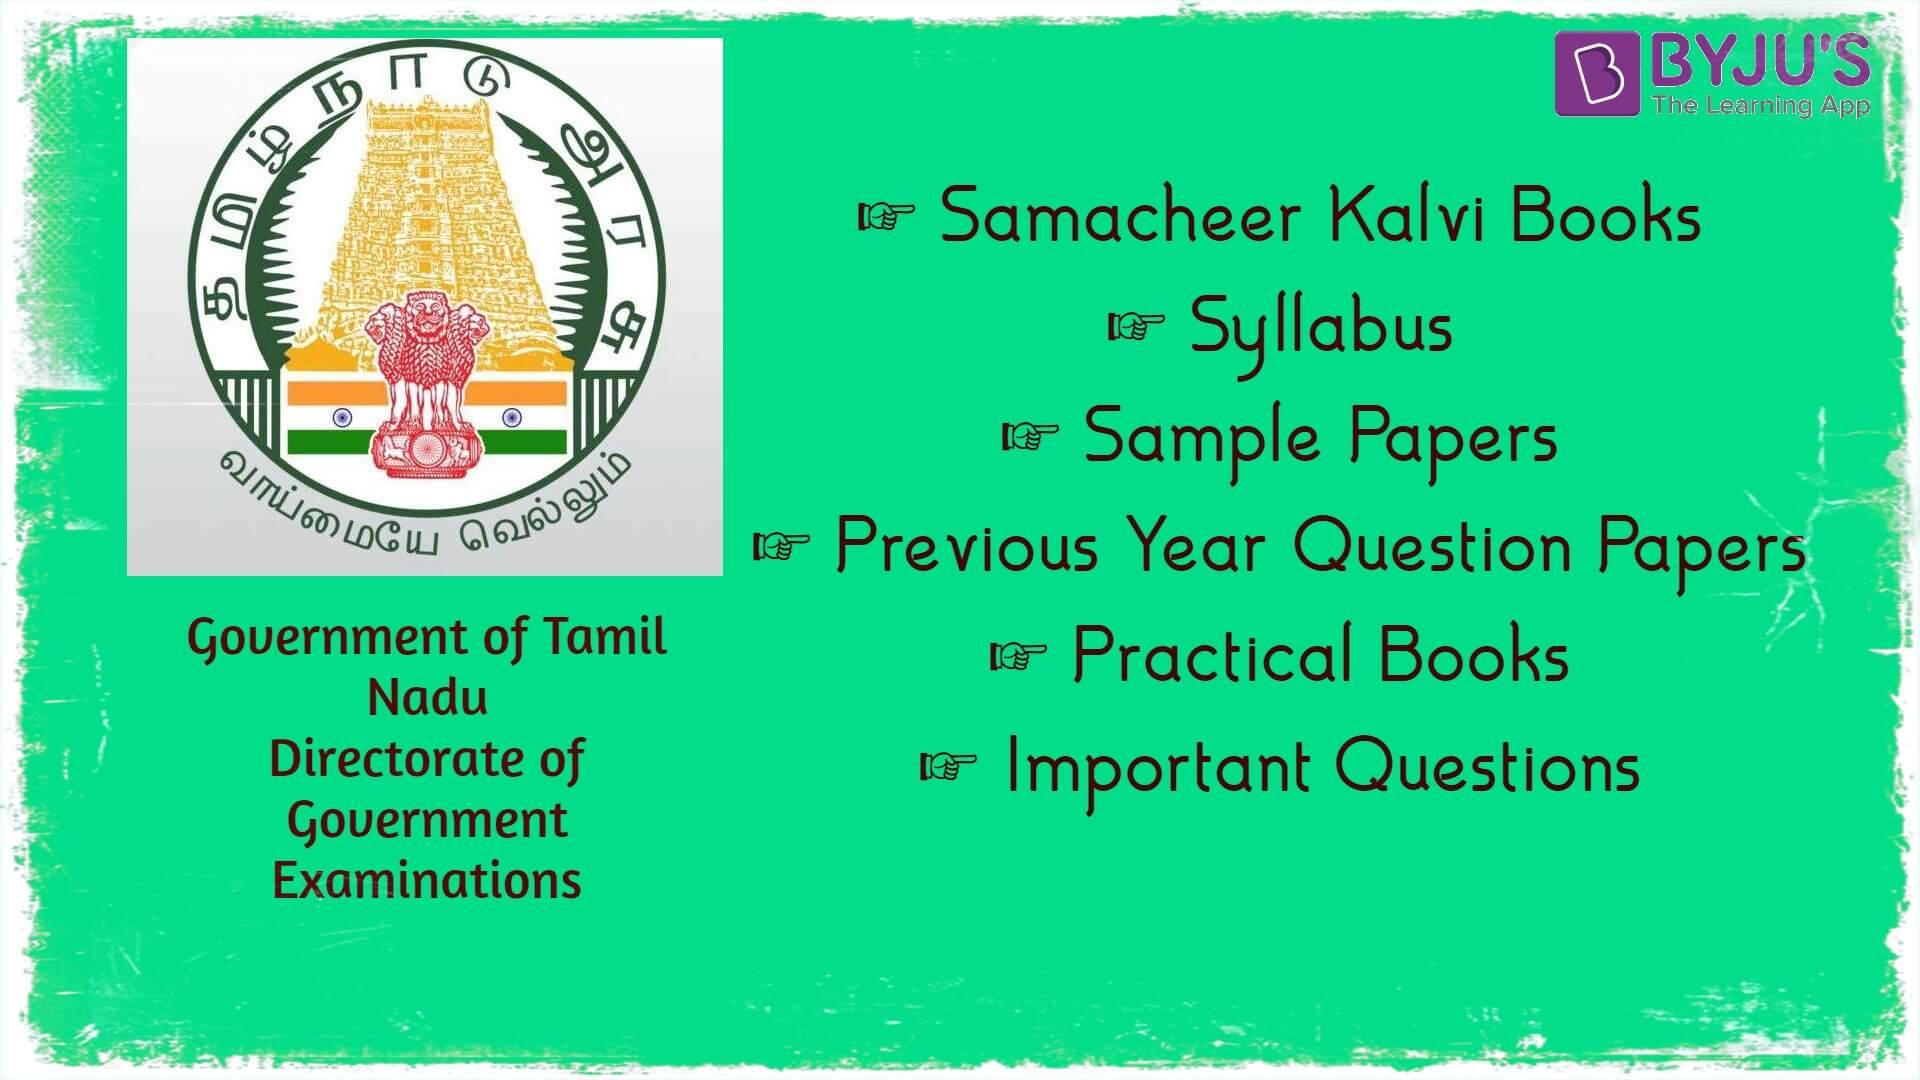 Tamil Nadu State Education Board